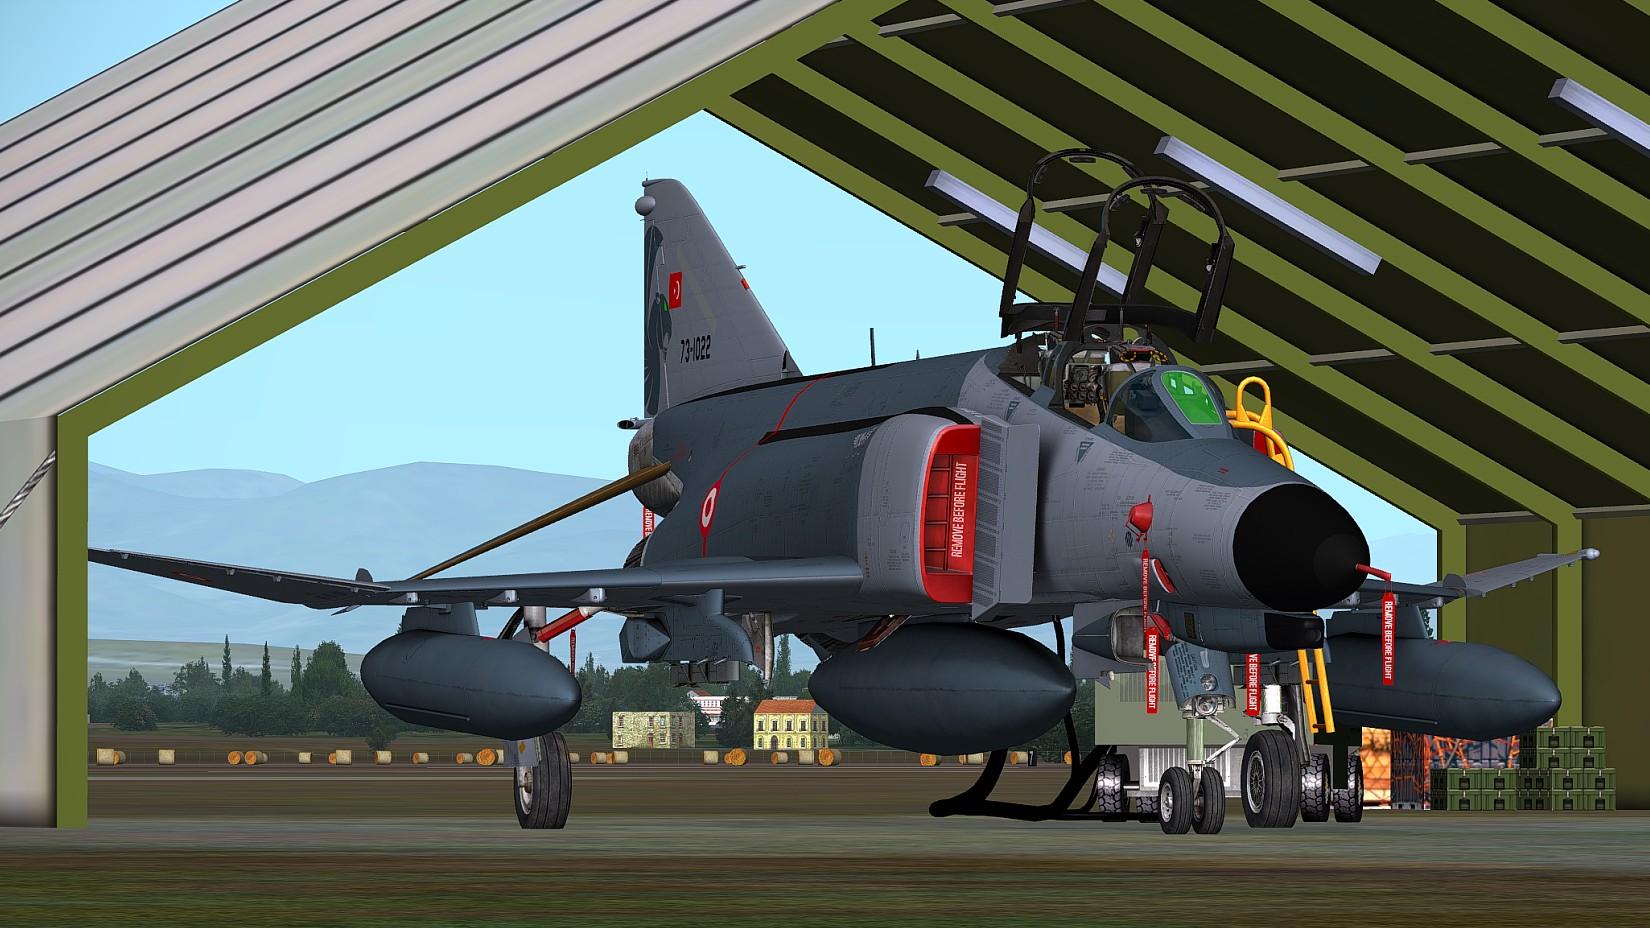 FSX/P3D] Milviz: F-4E Phantom II - Ariel Creation - Flight Simulator